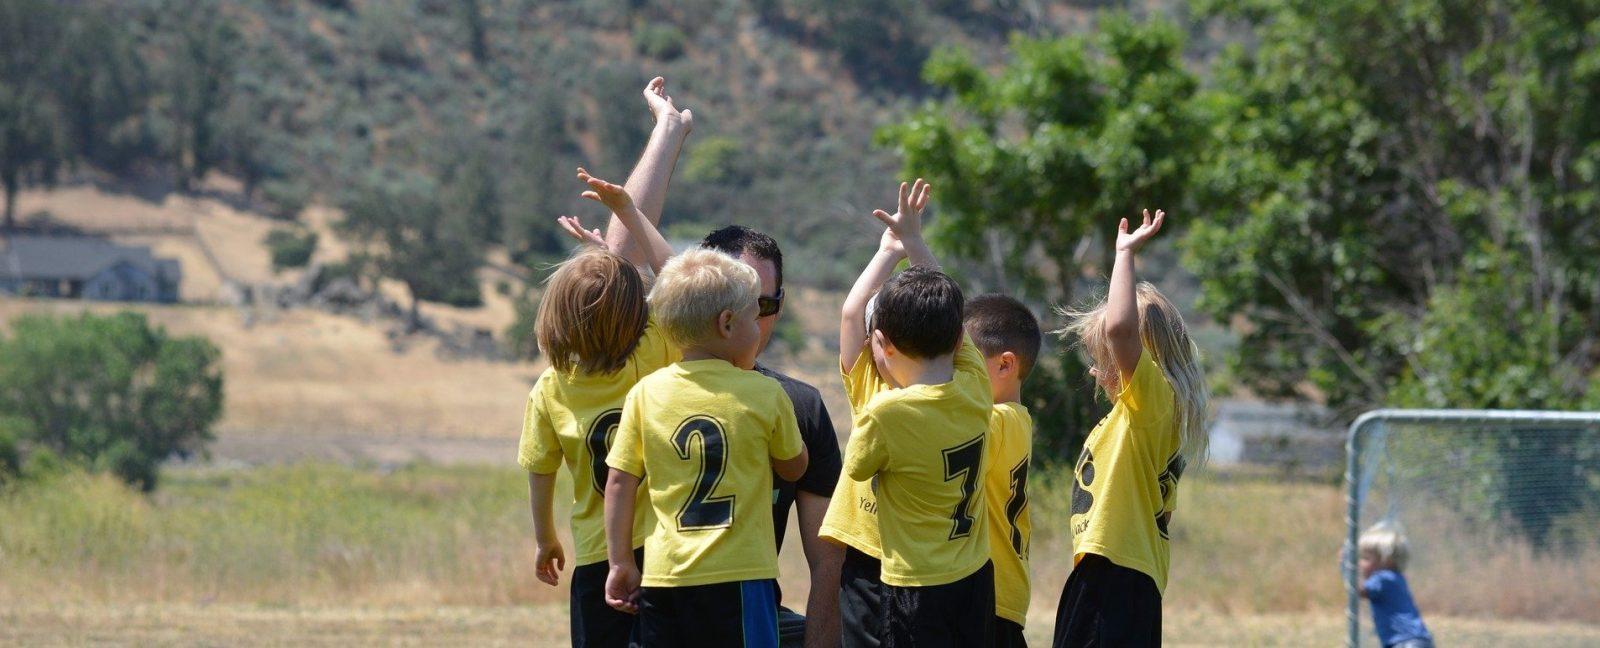 Lasten jalkapallojoukkue juhlii valmentajan ympärillä